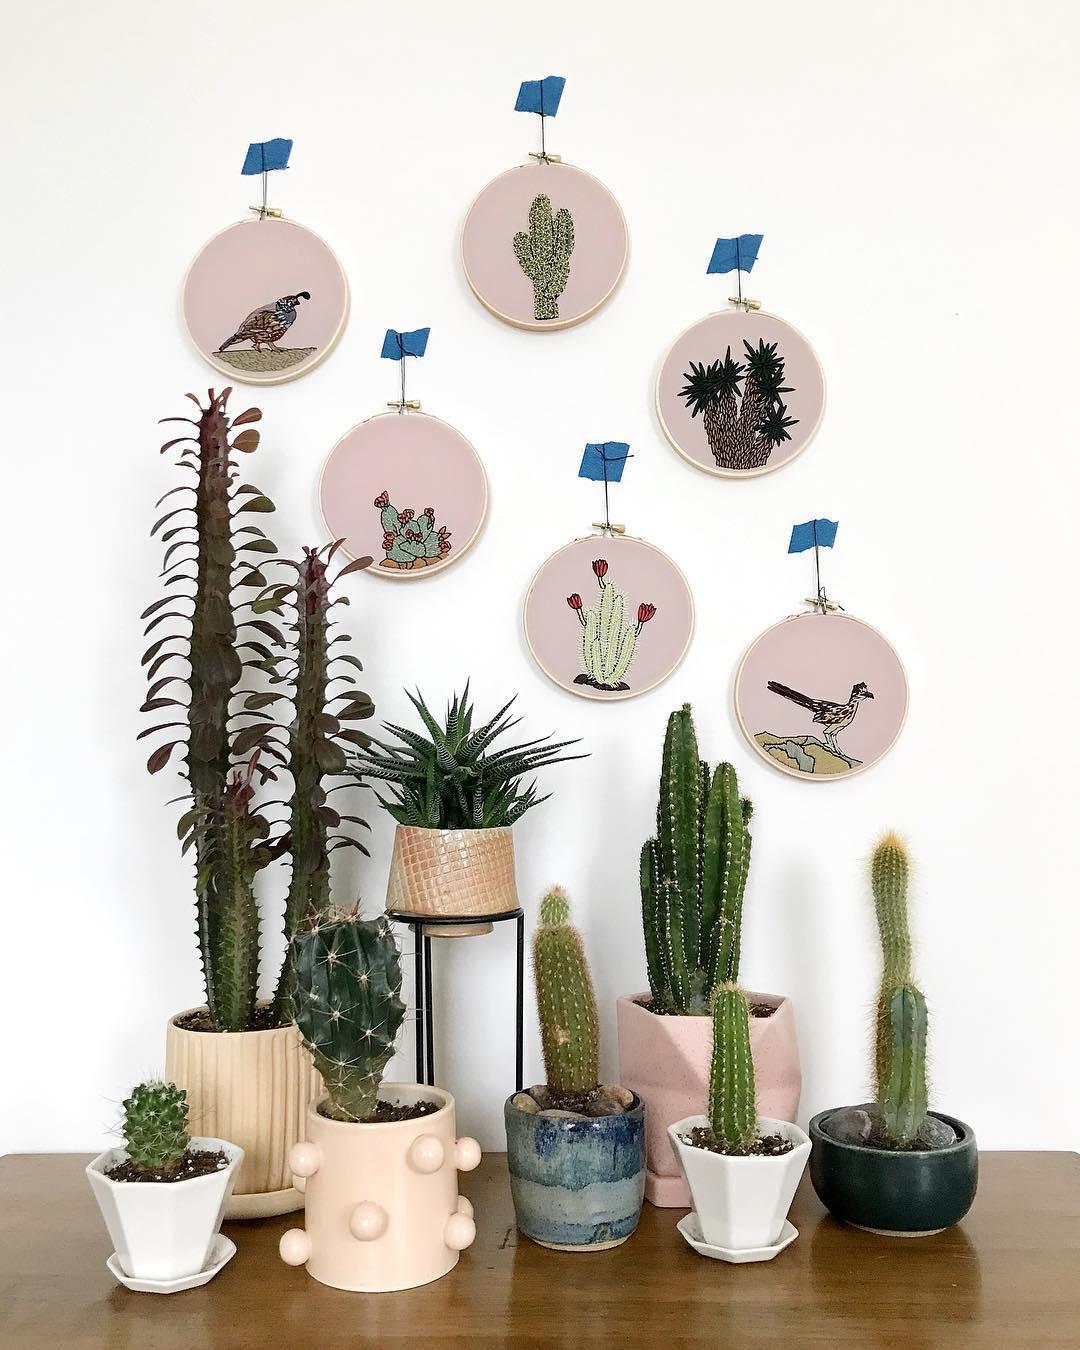 Desert embroidery patterns by Sarah K. Benning